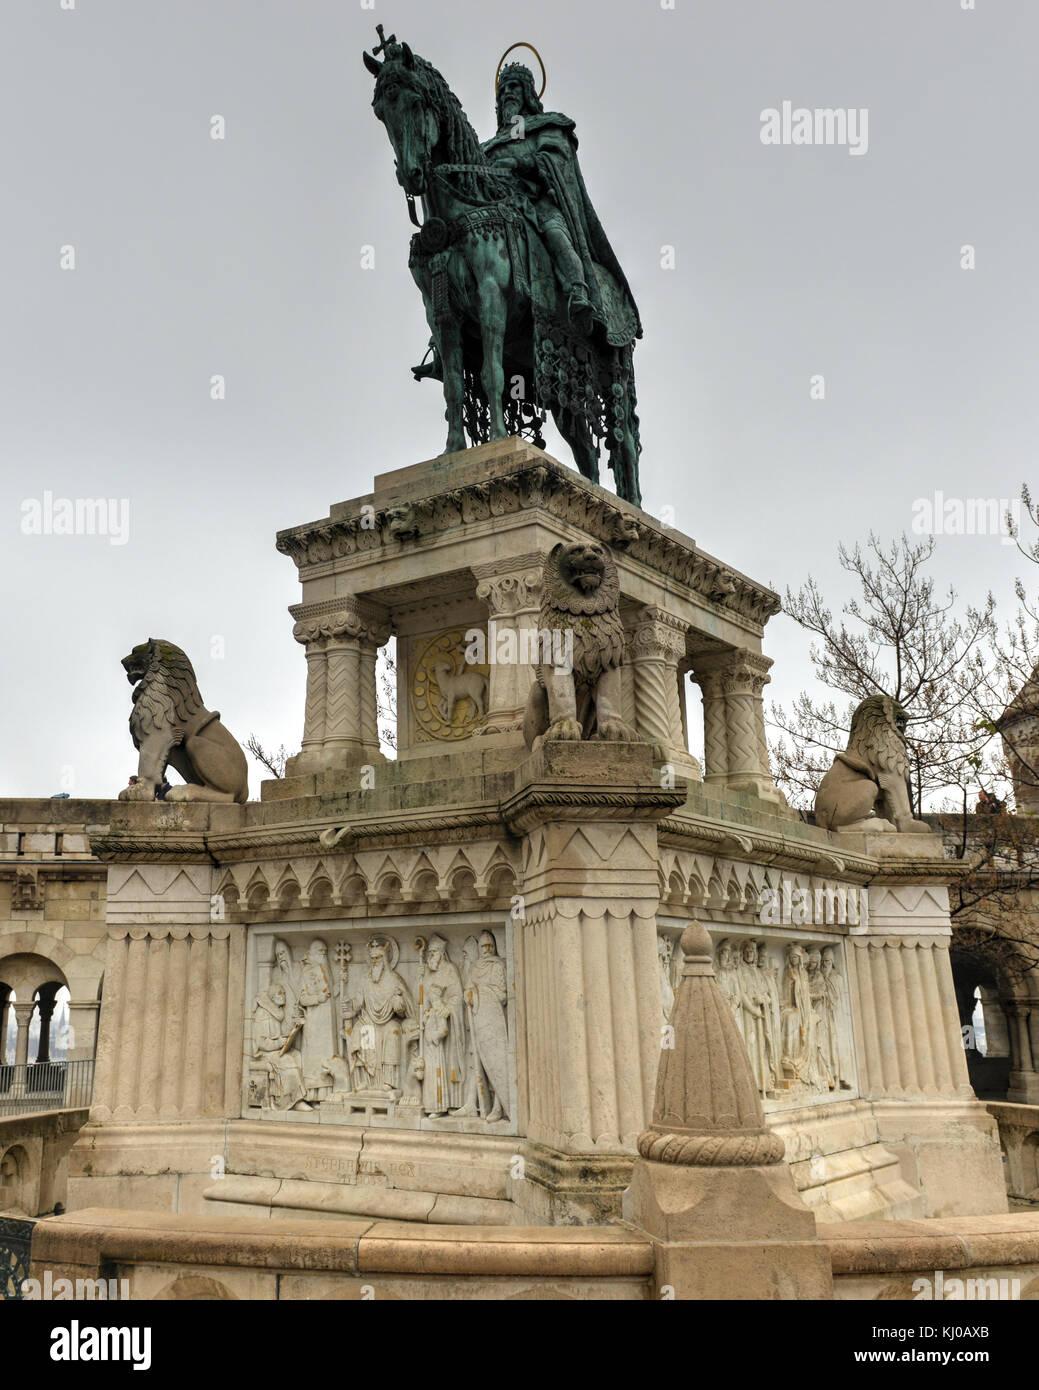 Stephen (Istvan) I Monument at Fisherman's Bastion in Budapest, Hungary Stock Photo